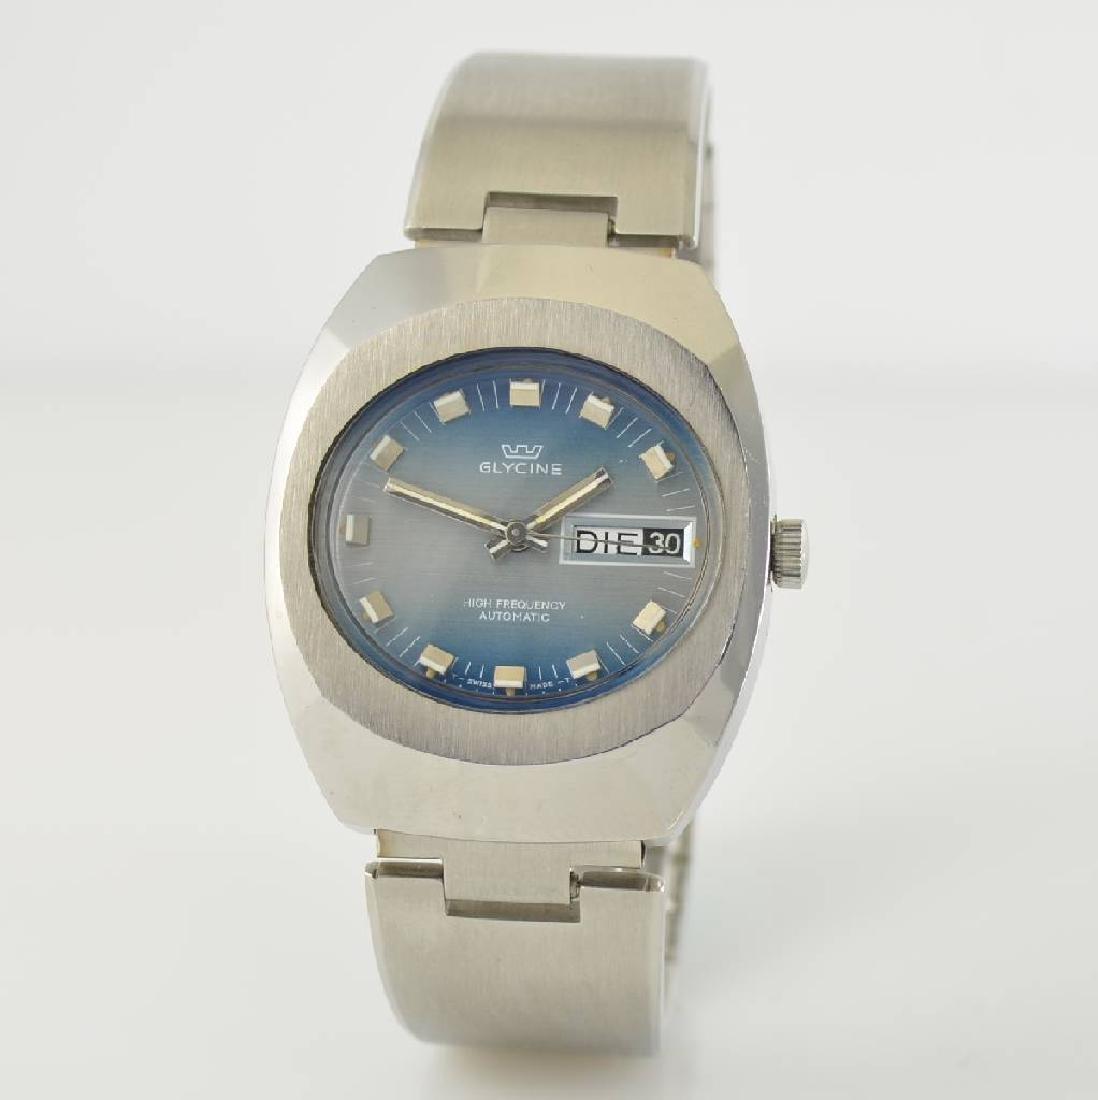 GLYCINE High Frequency gents wristwatch - 3